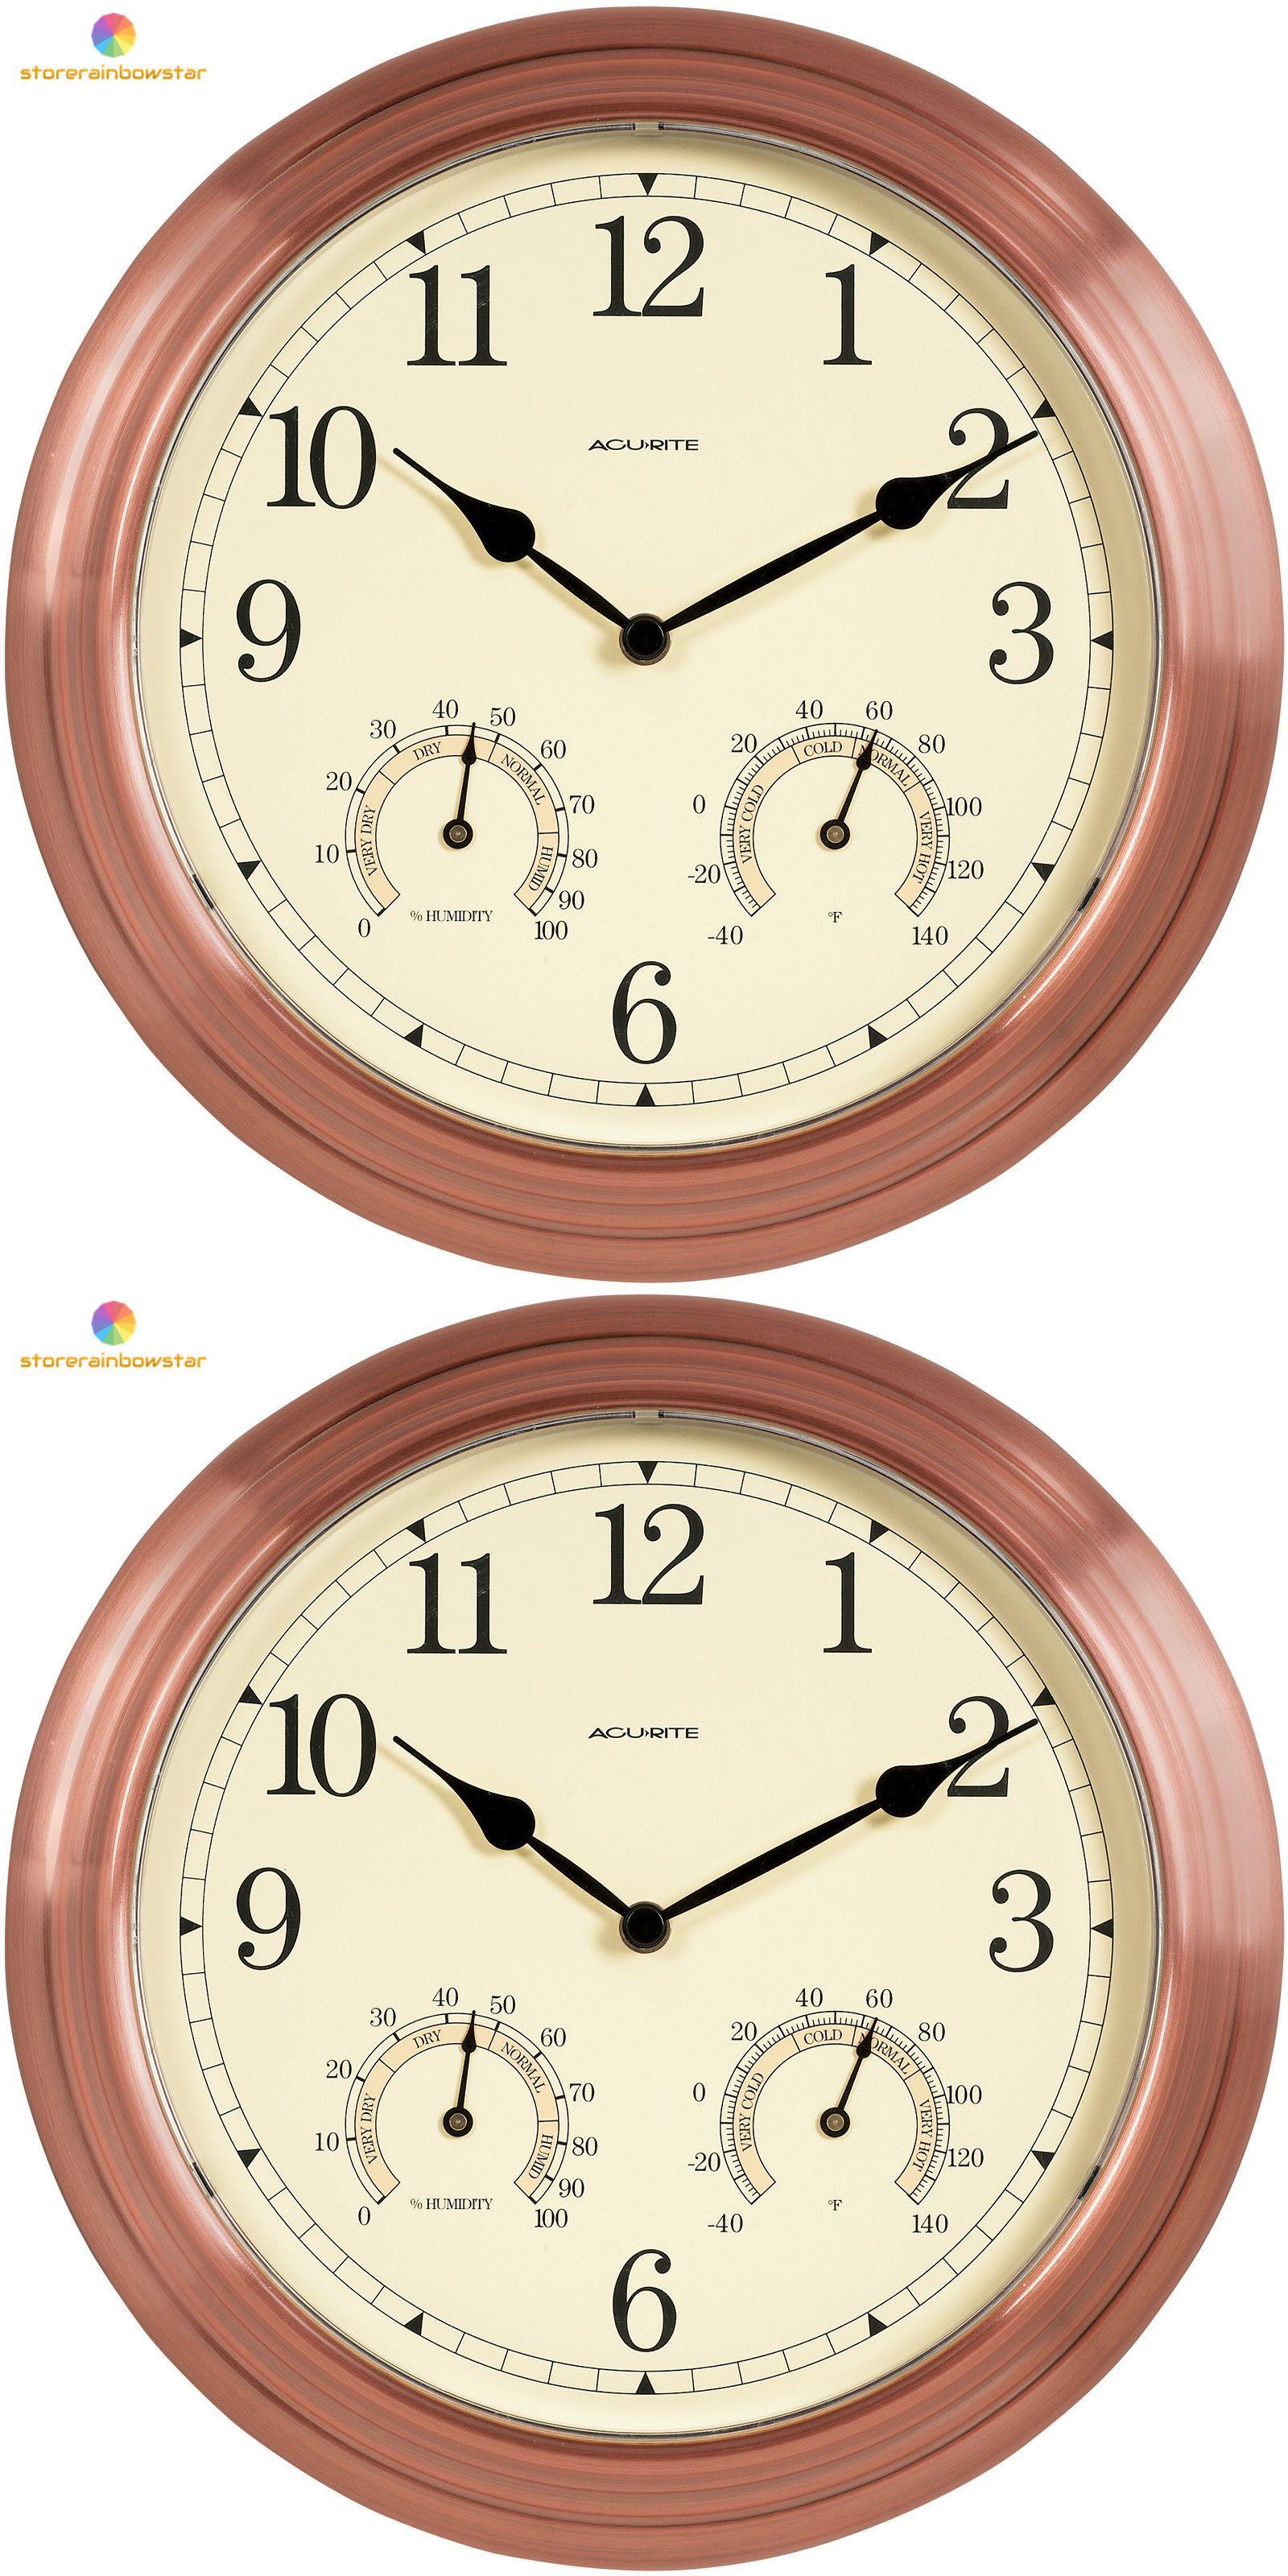 Patio wall clocks crunchymustard wall clocks 20561 outdoor clock thermometer garden patio amipublicfo Choice Image